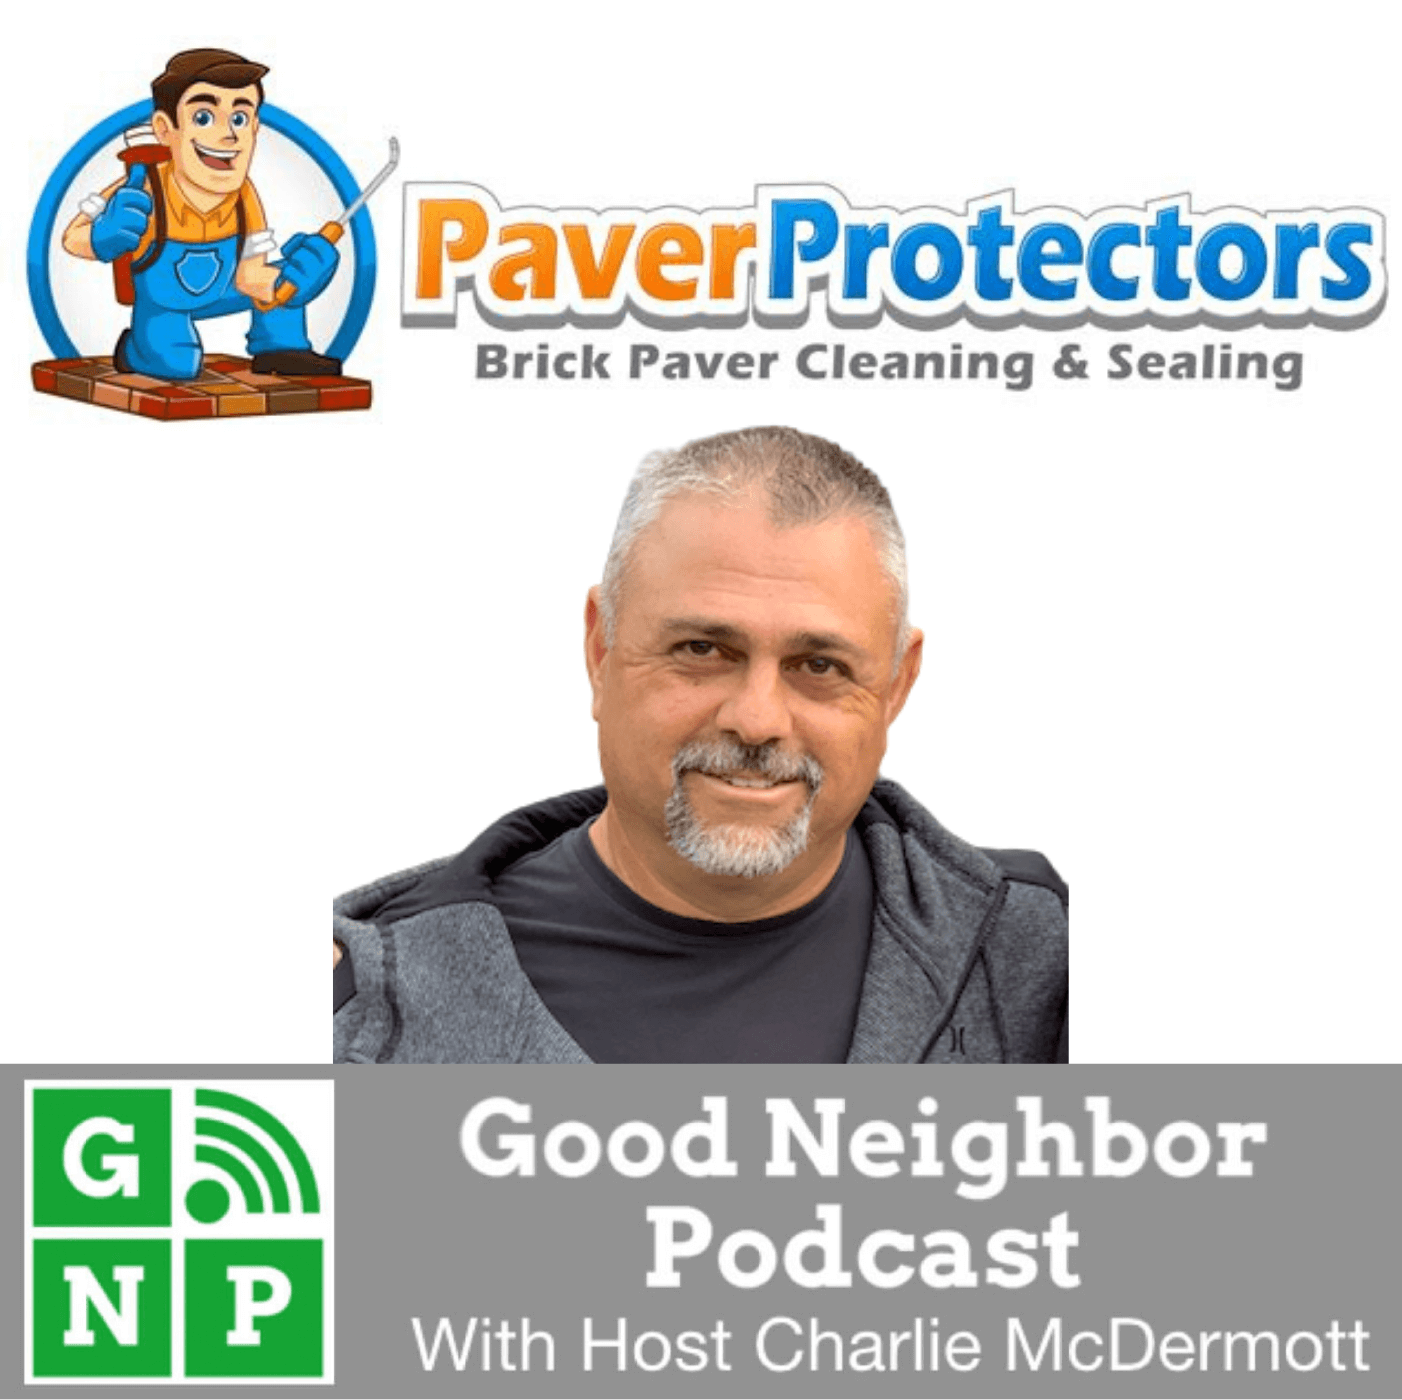 GNP - Paver Protectors - BADGE